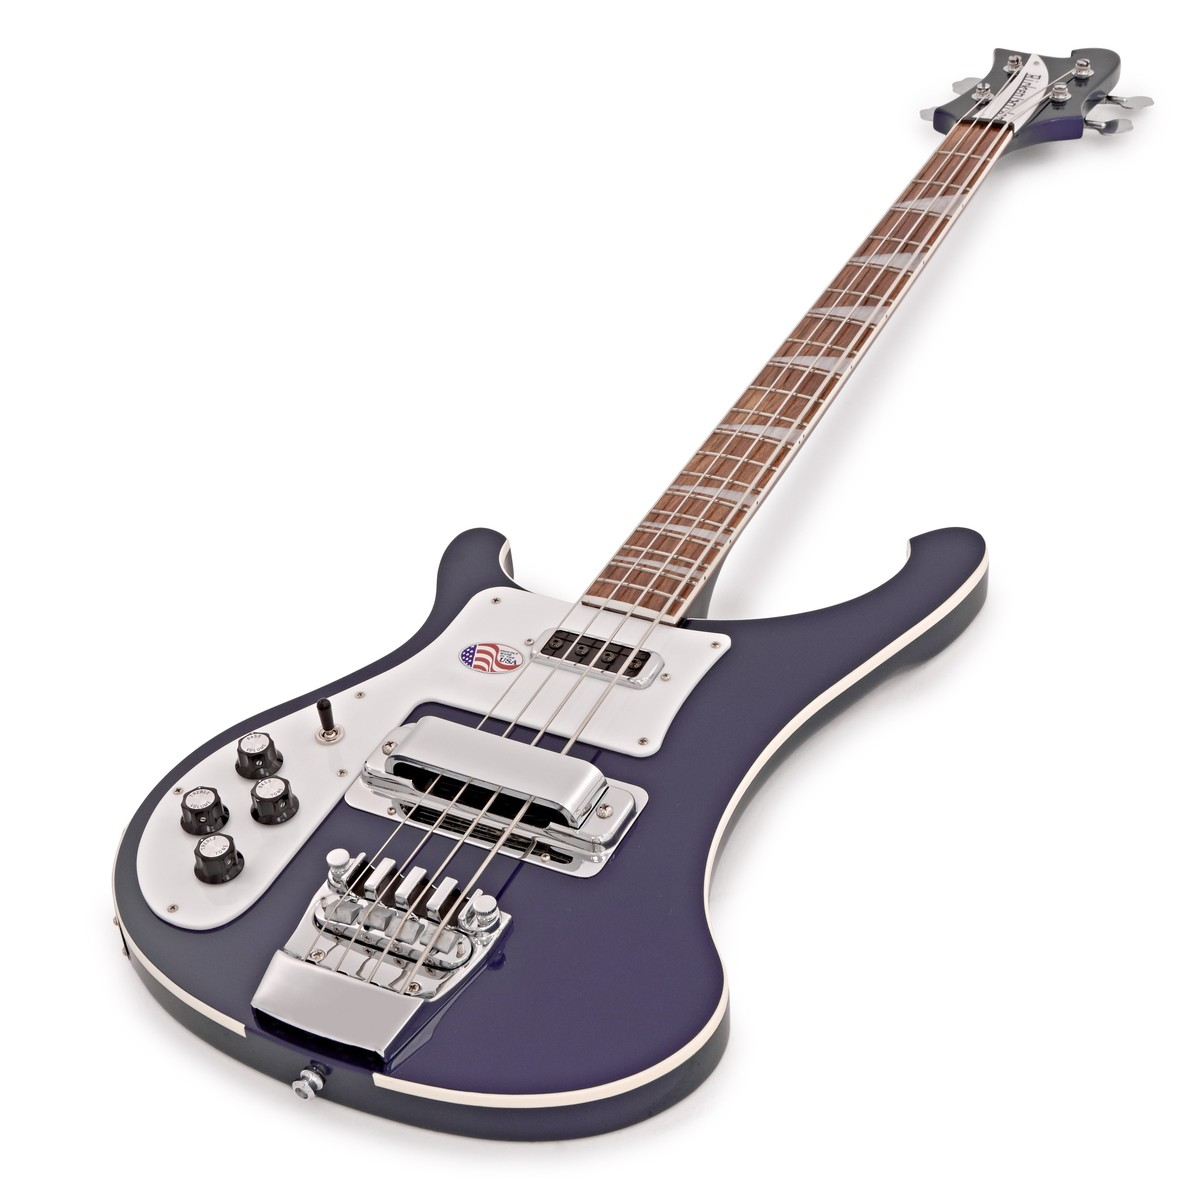 rickenbacker 4003l left handed bass guitar midnight blue at gear4music. Black Bedroom Furniture Sets. Home Design Ideas